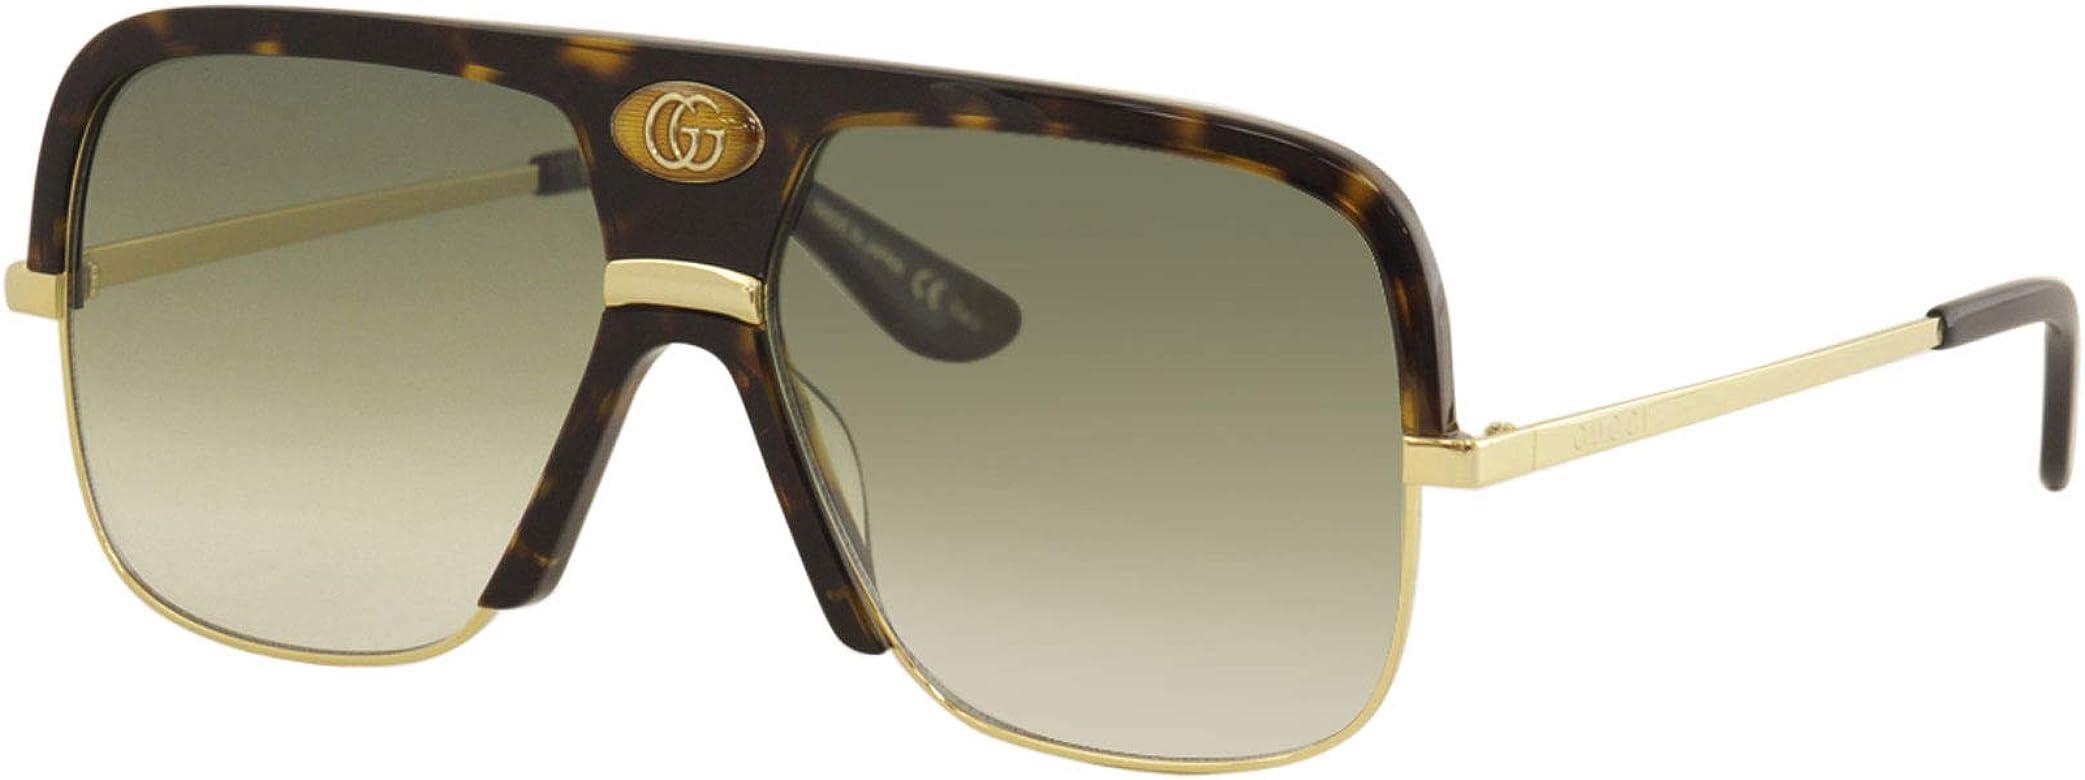 Sunglasses Gucci GG 0478 S- 002 HAVANA/GREEN GOLD